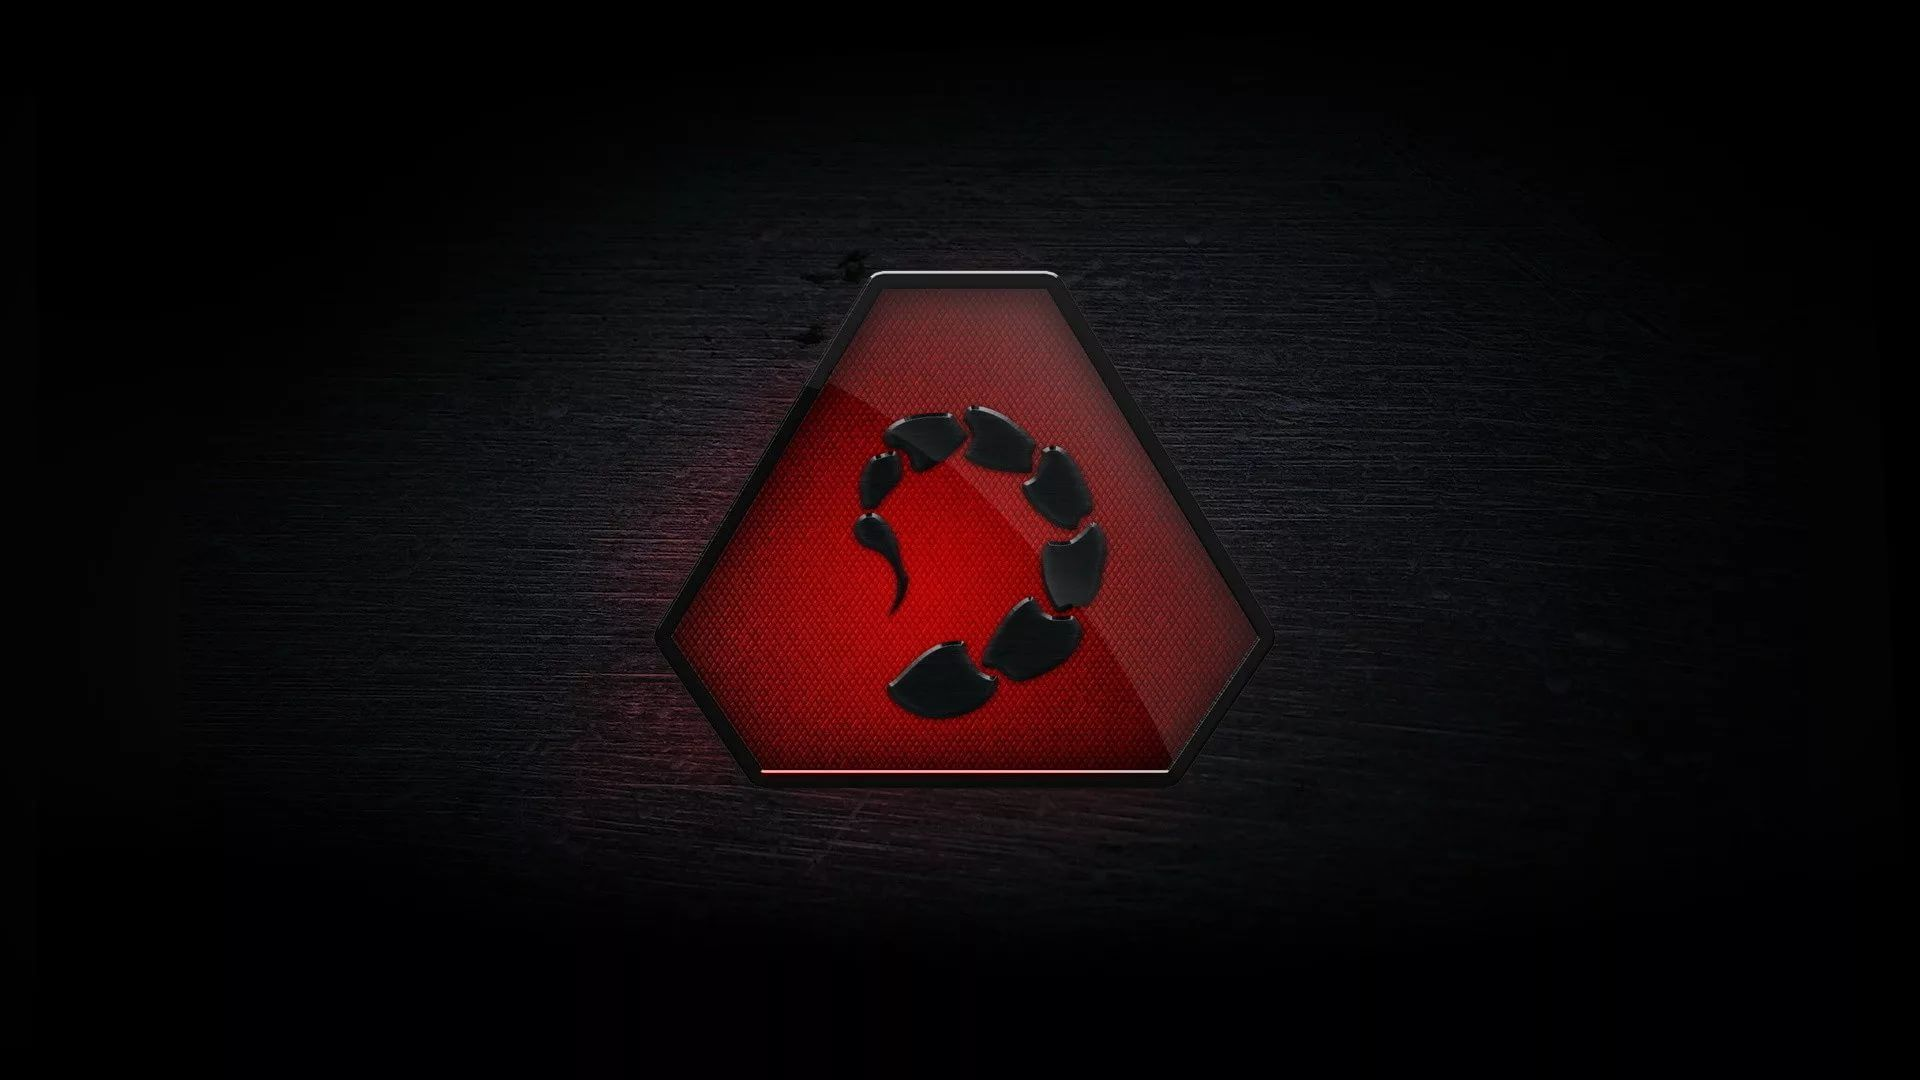 Scorpio download wallpaper image